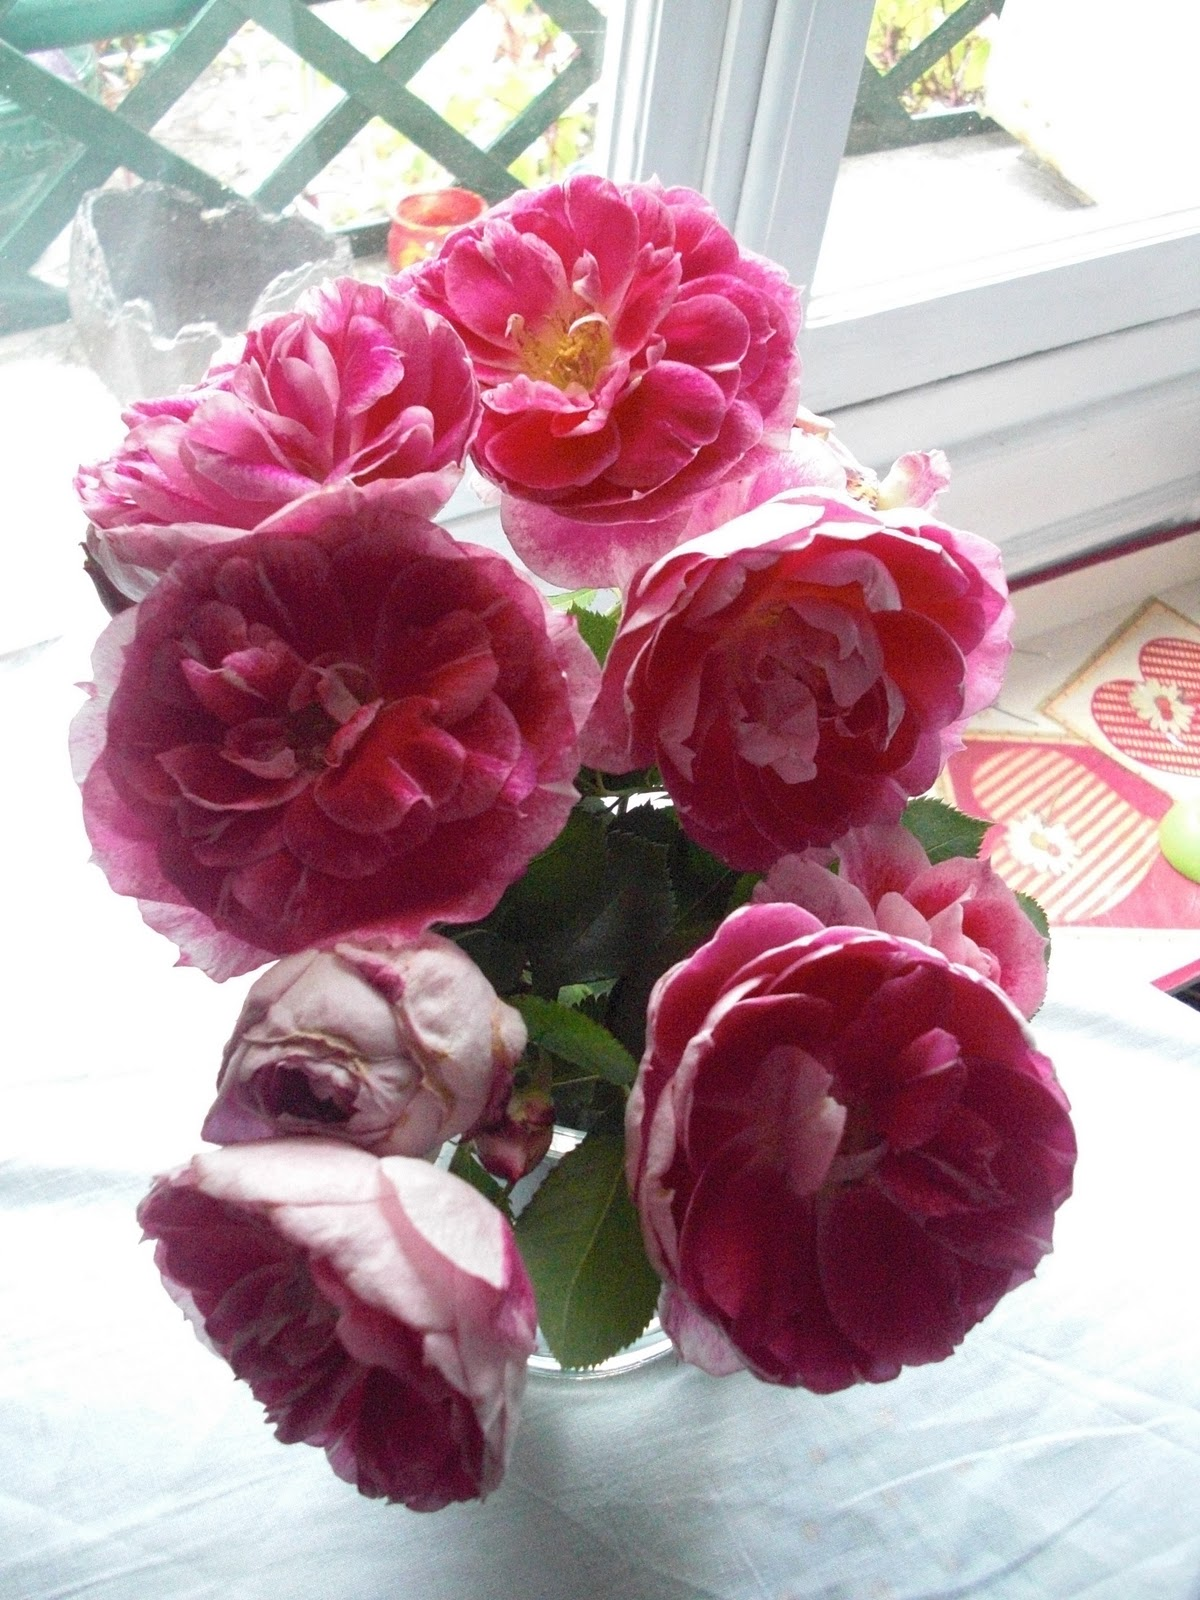 rose capucine le monde merveilleux de rose capucine. Black Bedroom Furniture Sets. Home Design Ideas